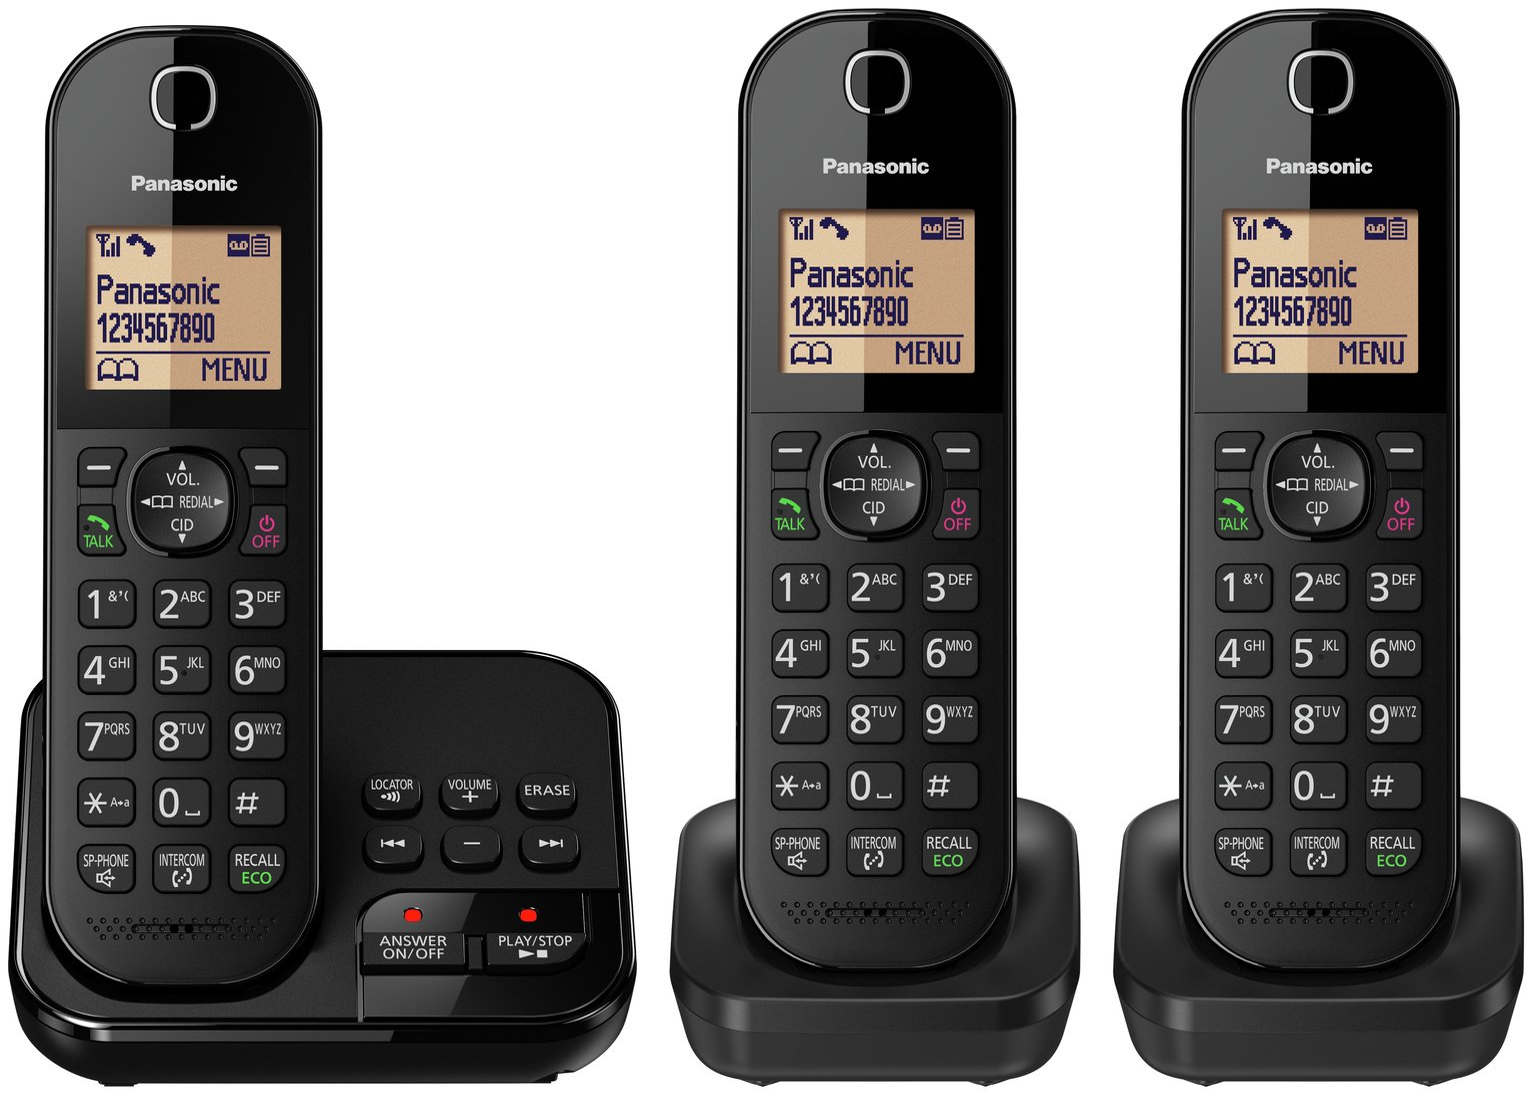 Panasonic Cordless Telephone with Answer Machine - Triple